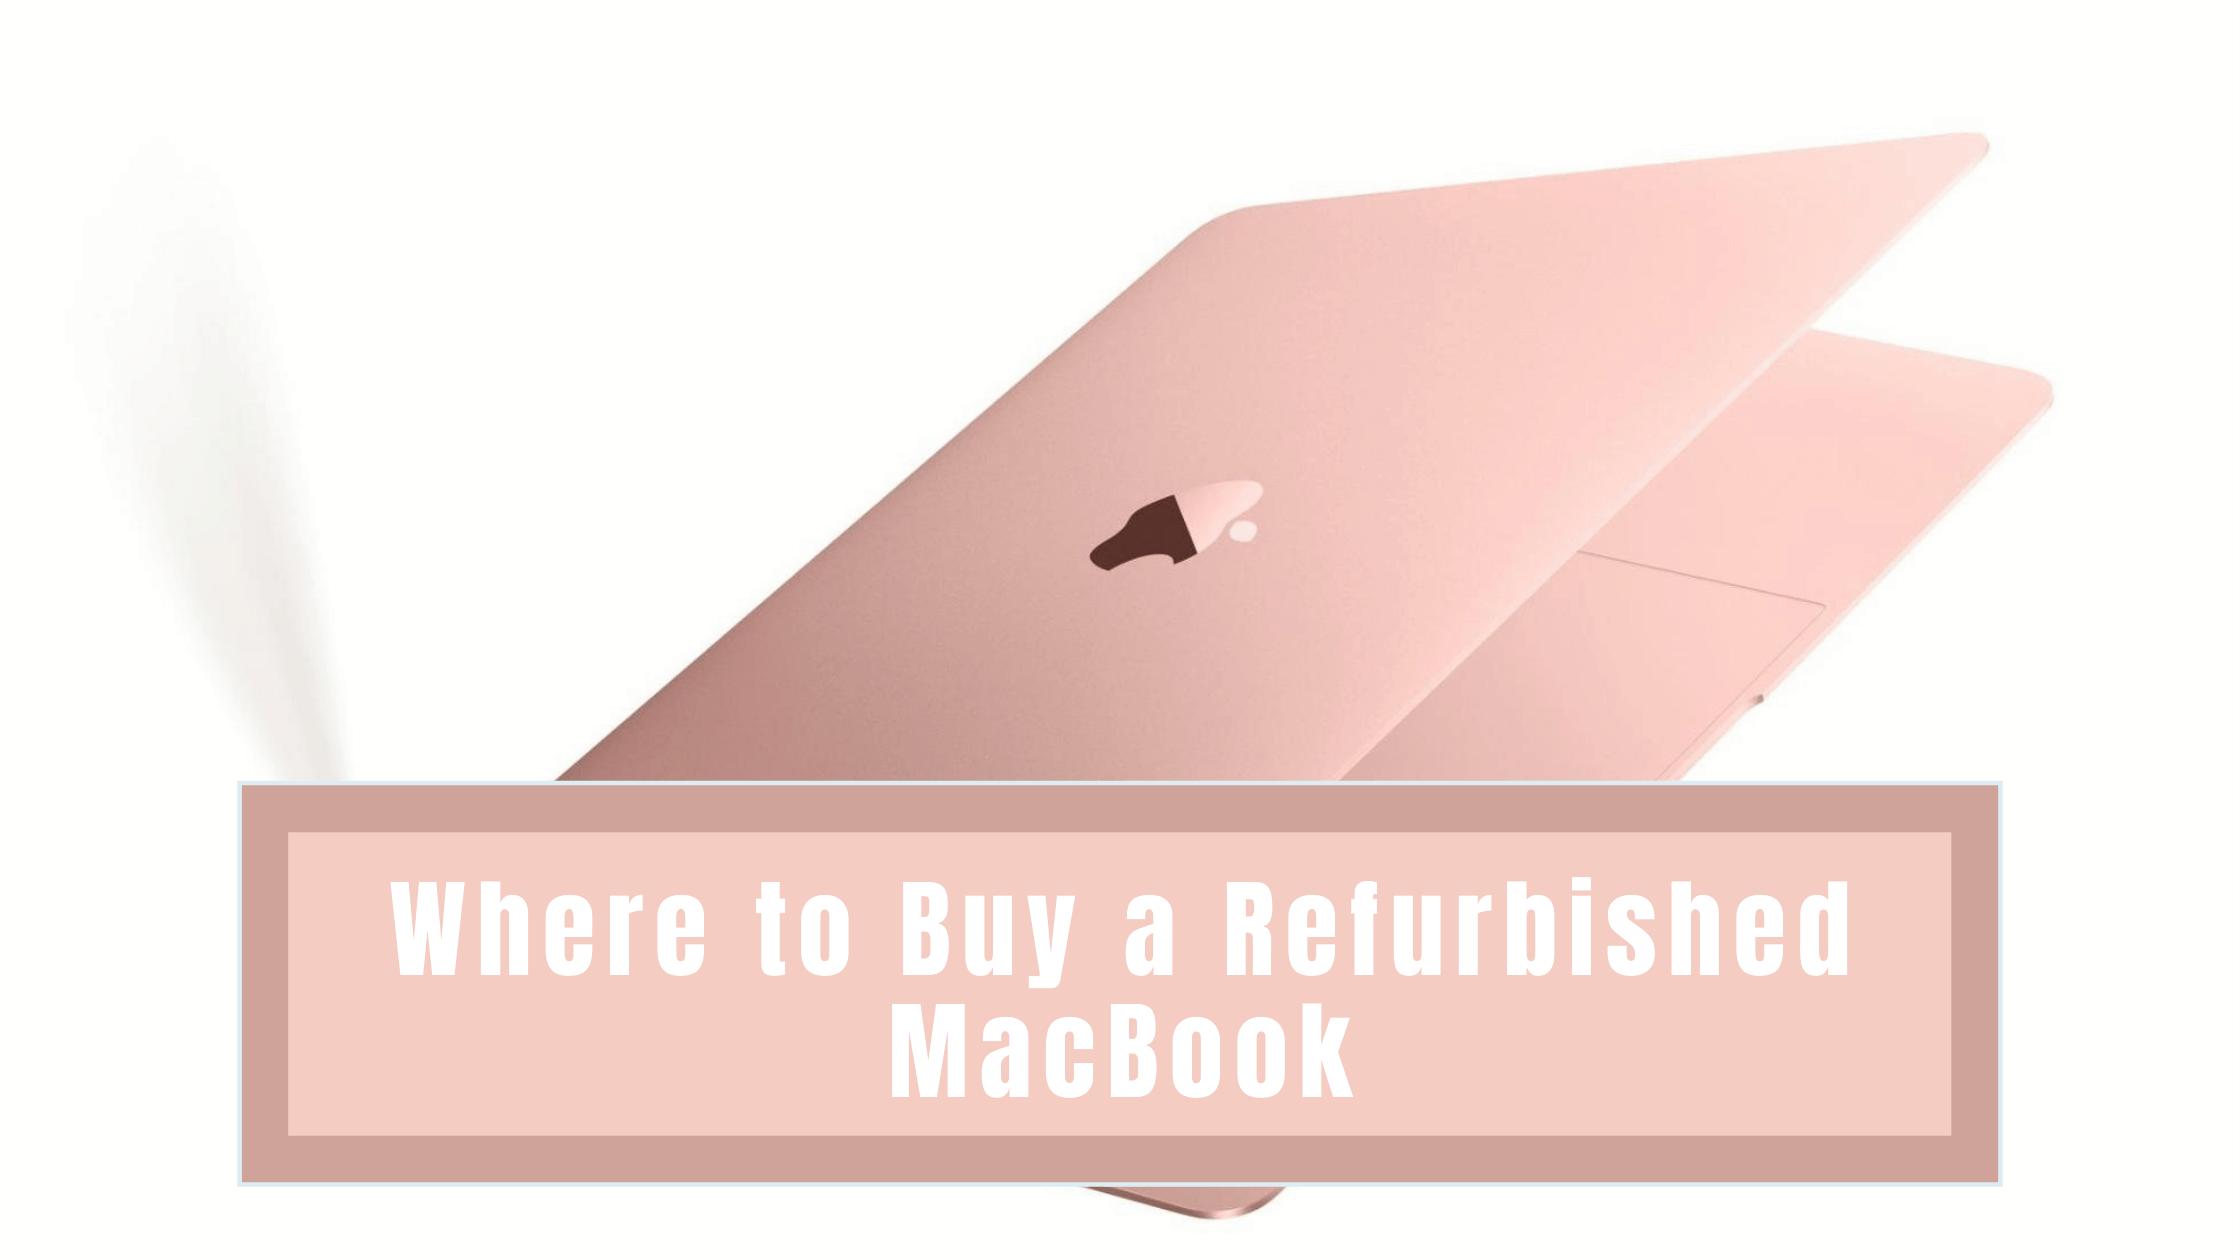 Where to Buy a Refurbished MacBook